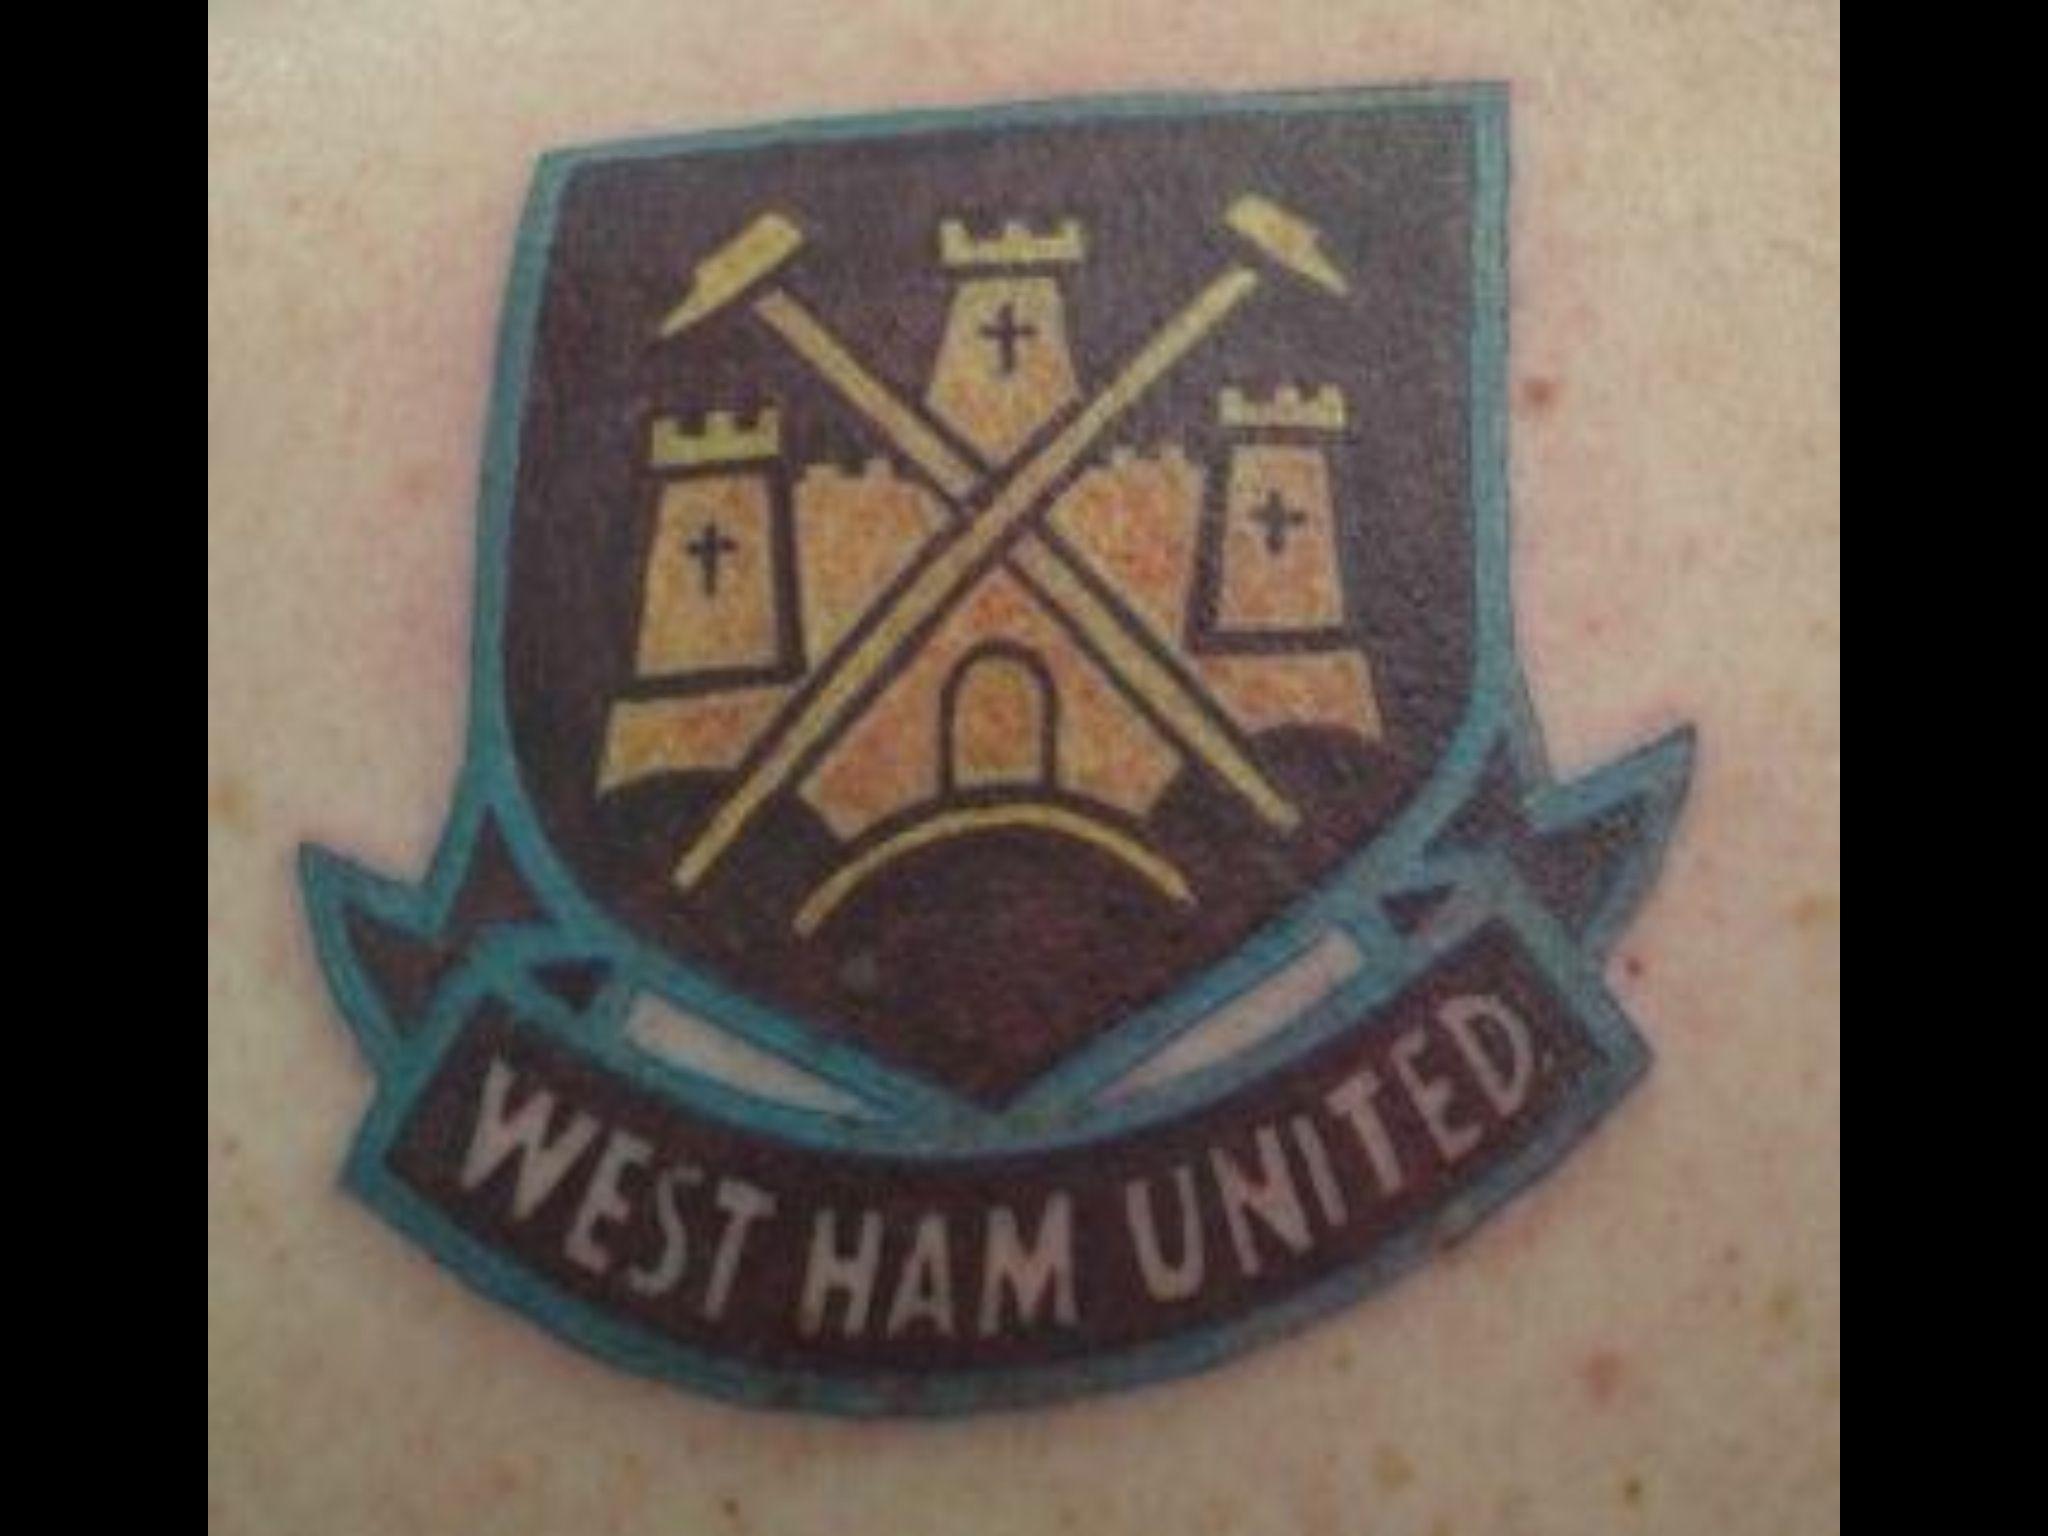 West Ham United badge tattoo   E&B bookmark   Tattoos, Black tattoos